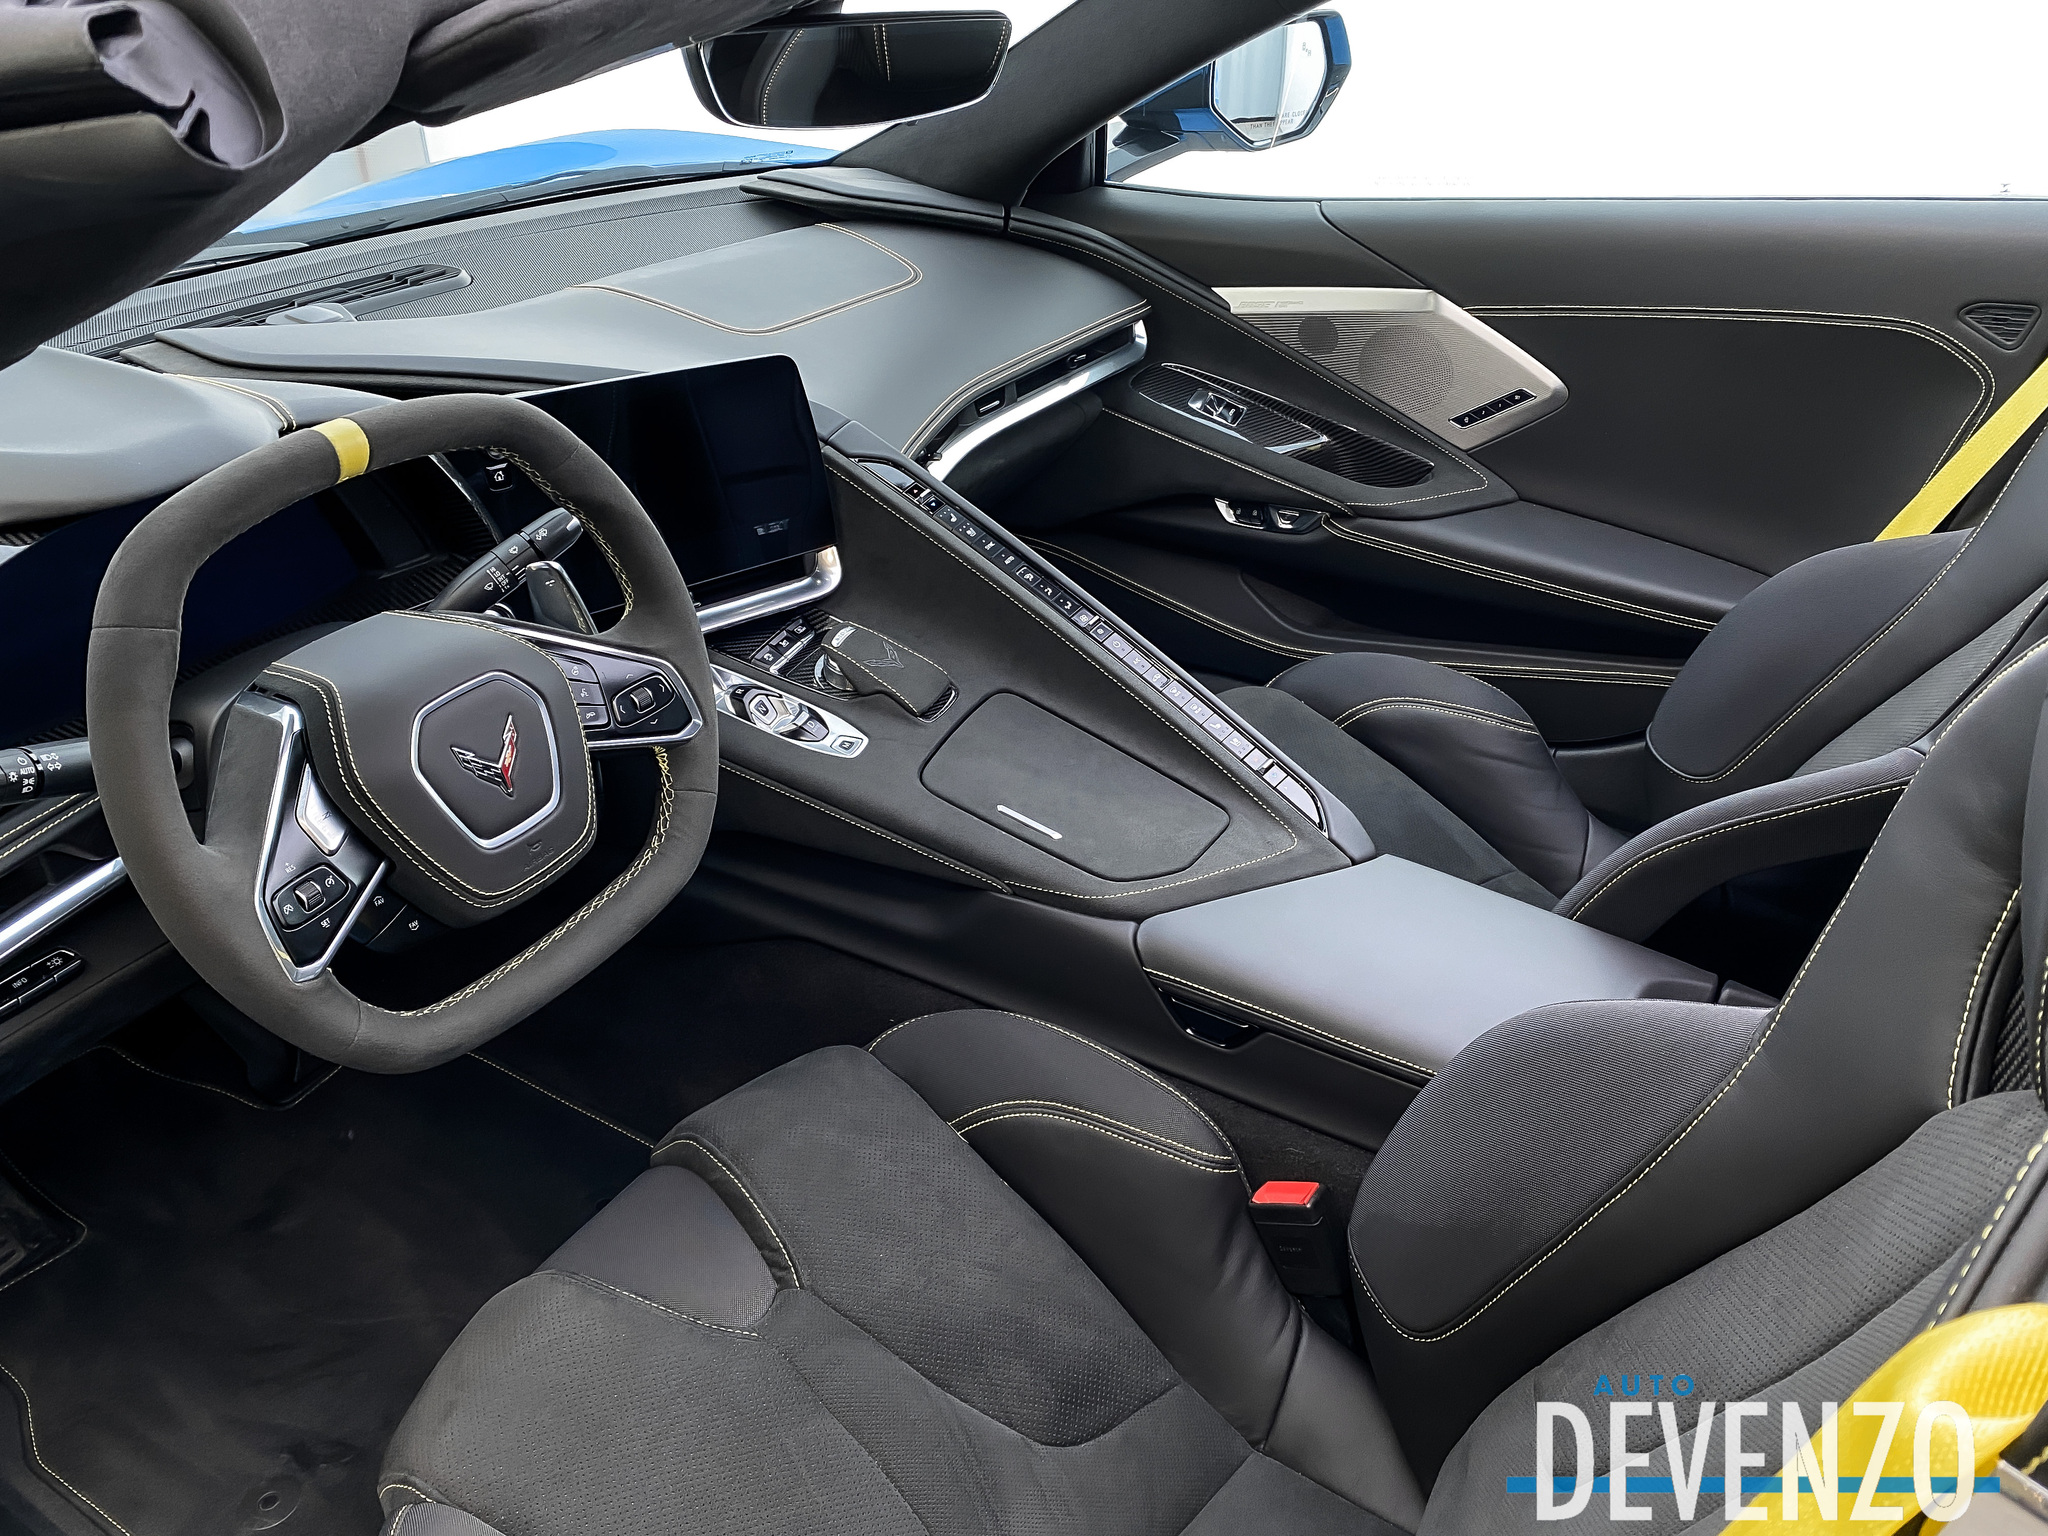 2020 Chevrolet Corvette Stingray 3LT Z51 PERFORMANCE + COMPETITION complet